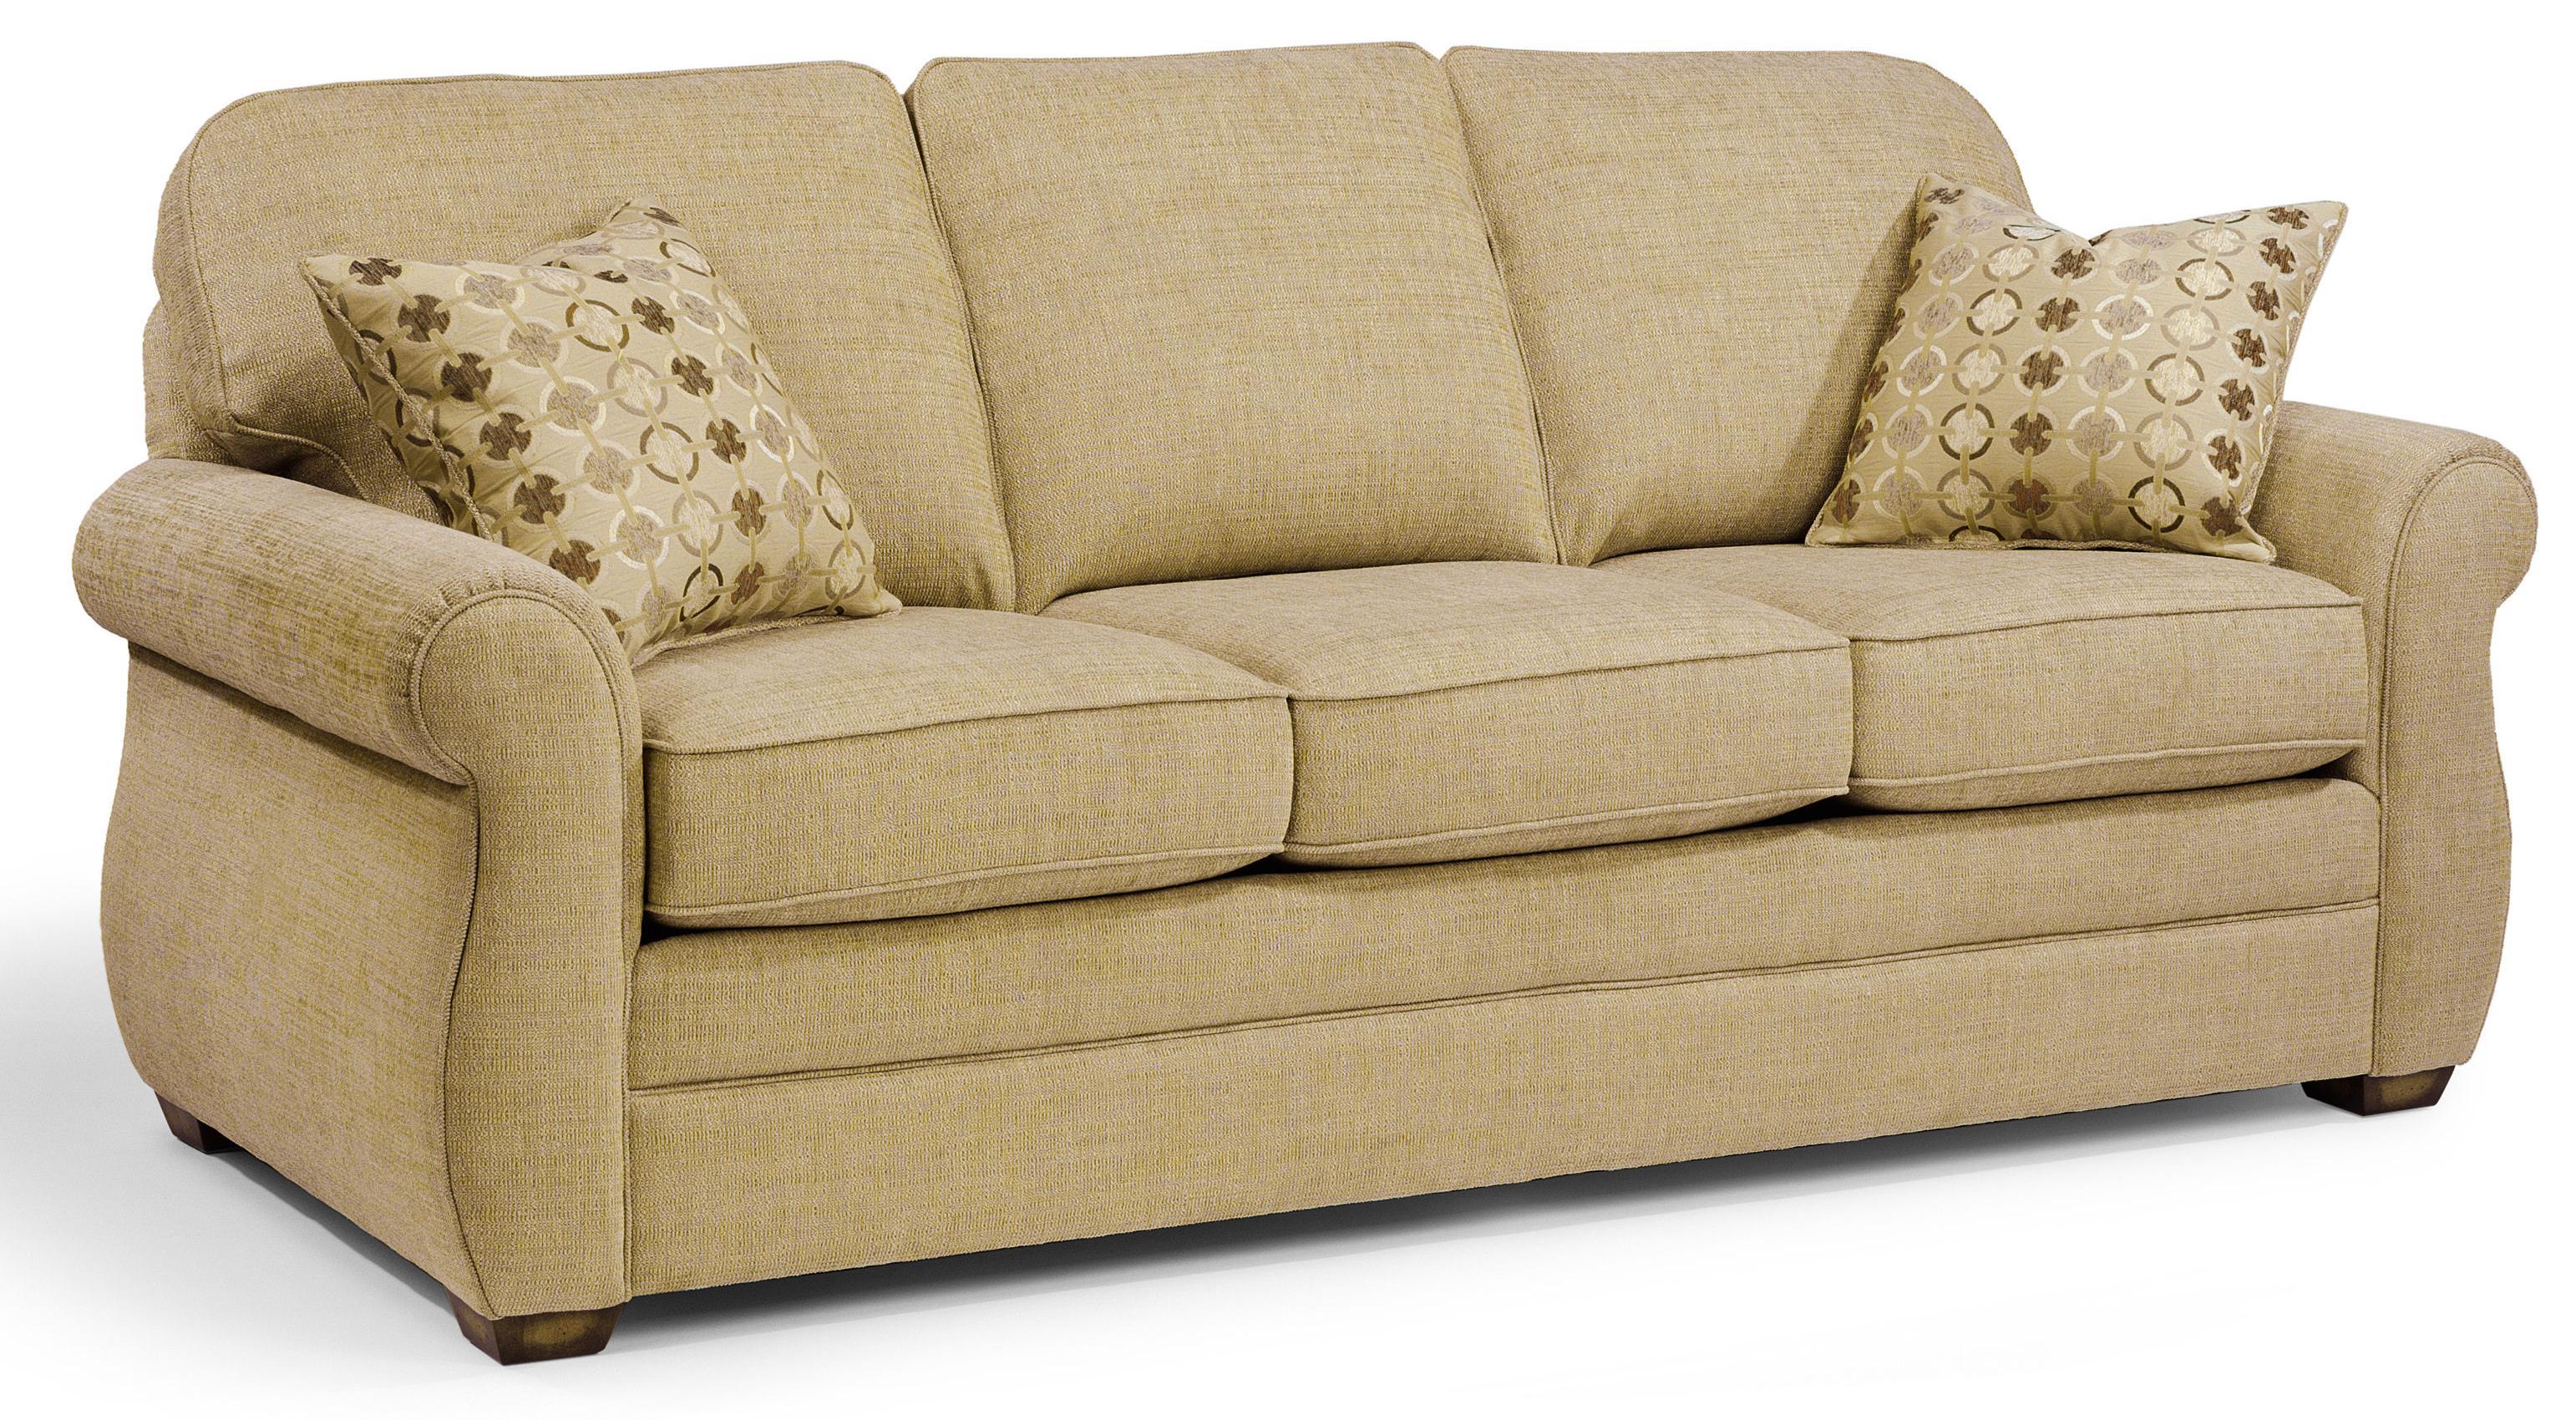 flexsteel sofas flexsteel whitney sofa - item number: 5643-31 SPWDOAX